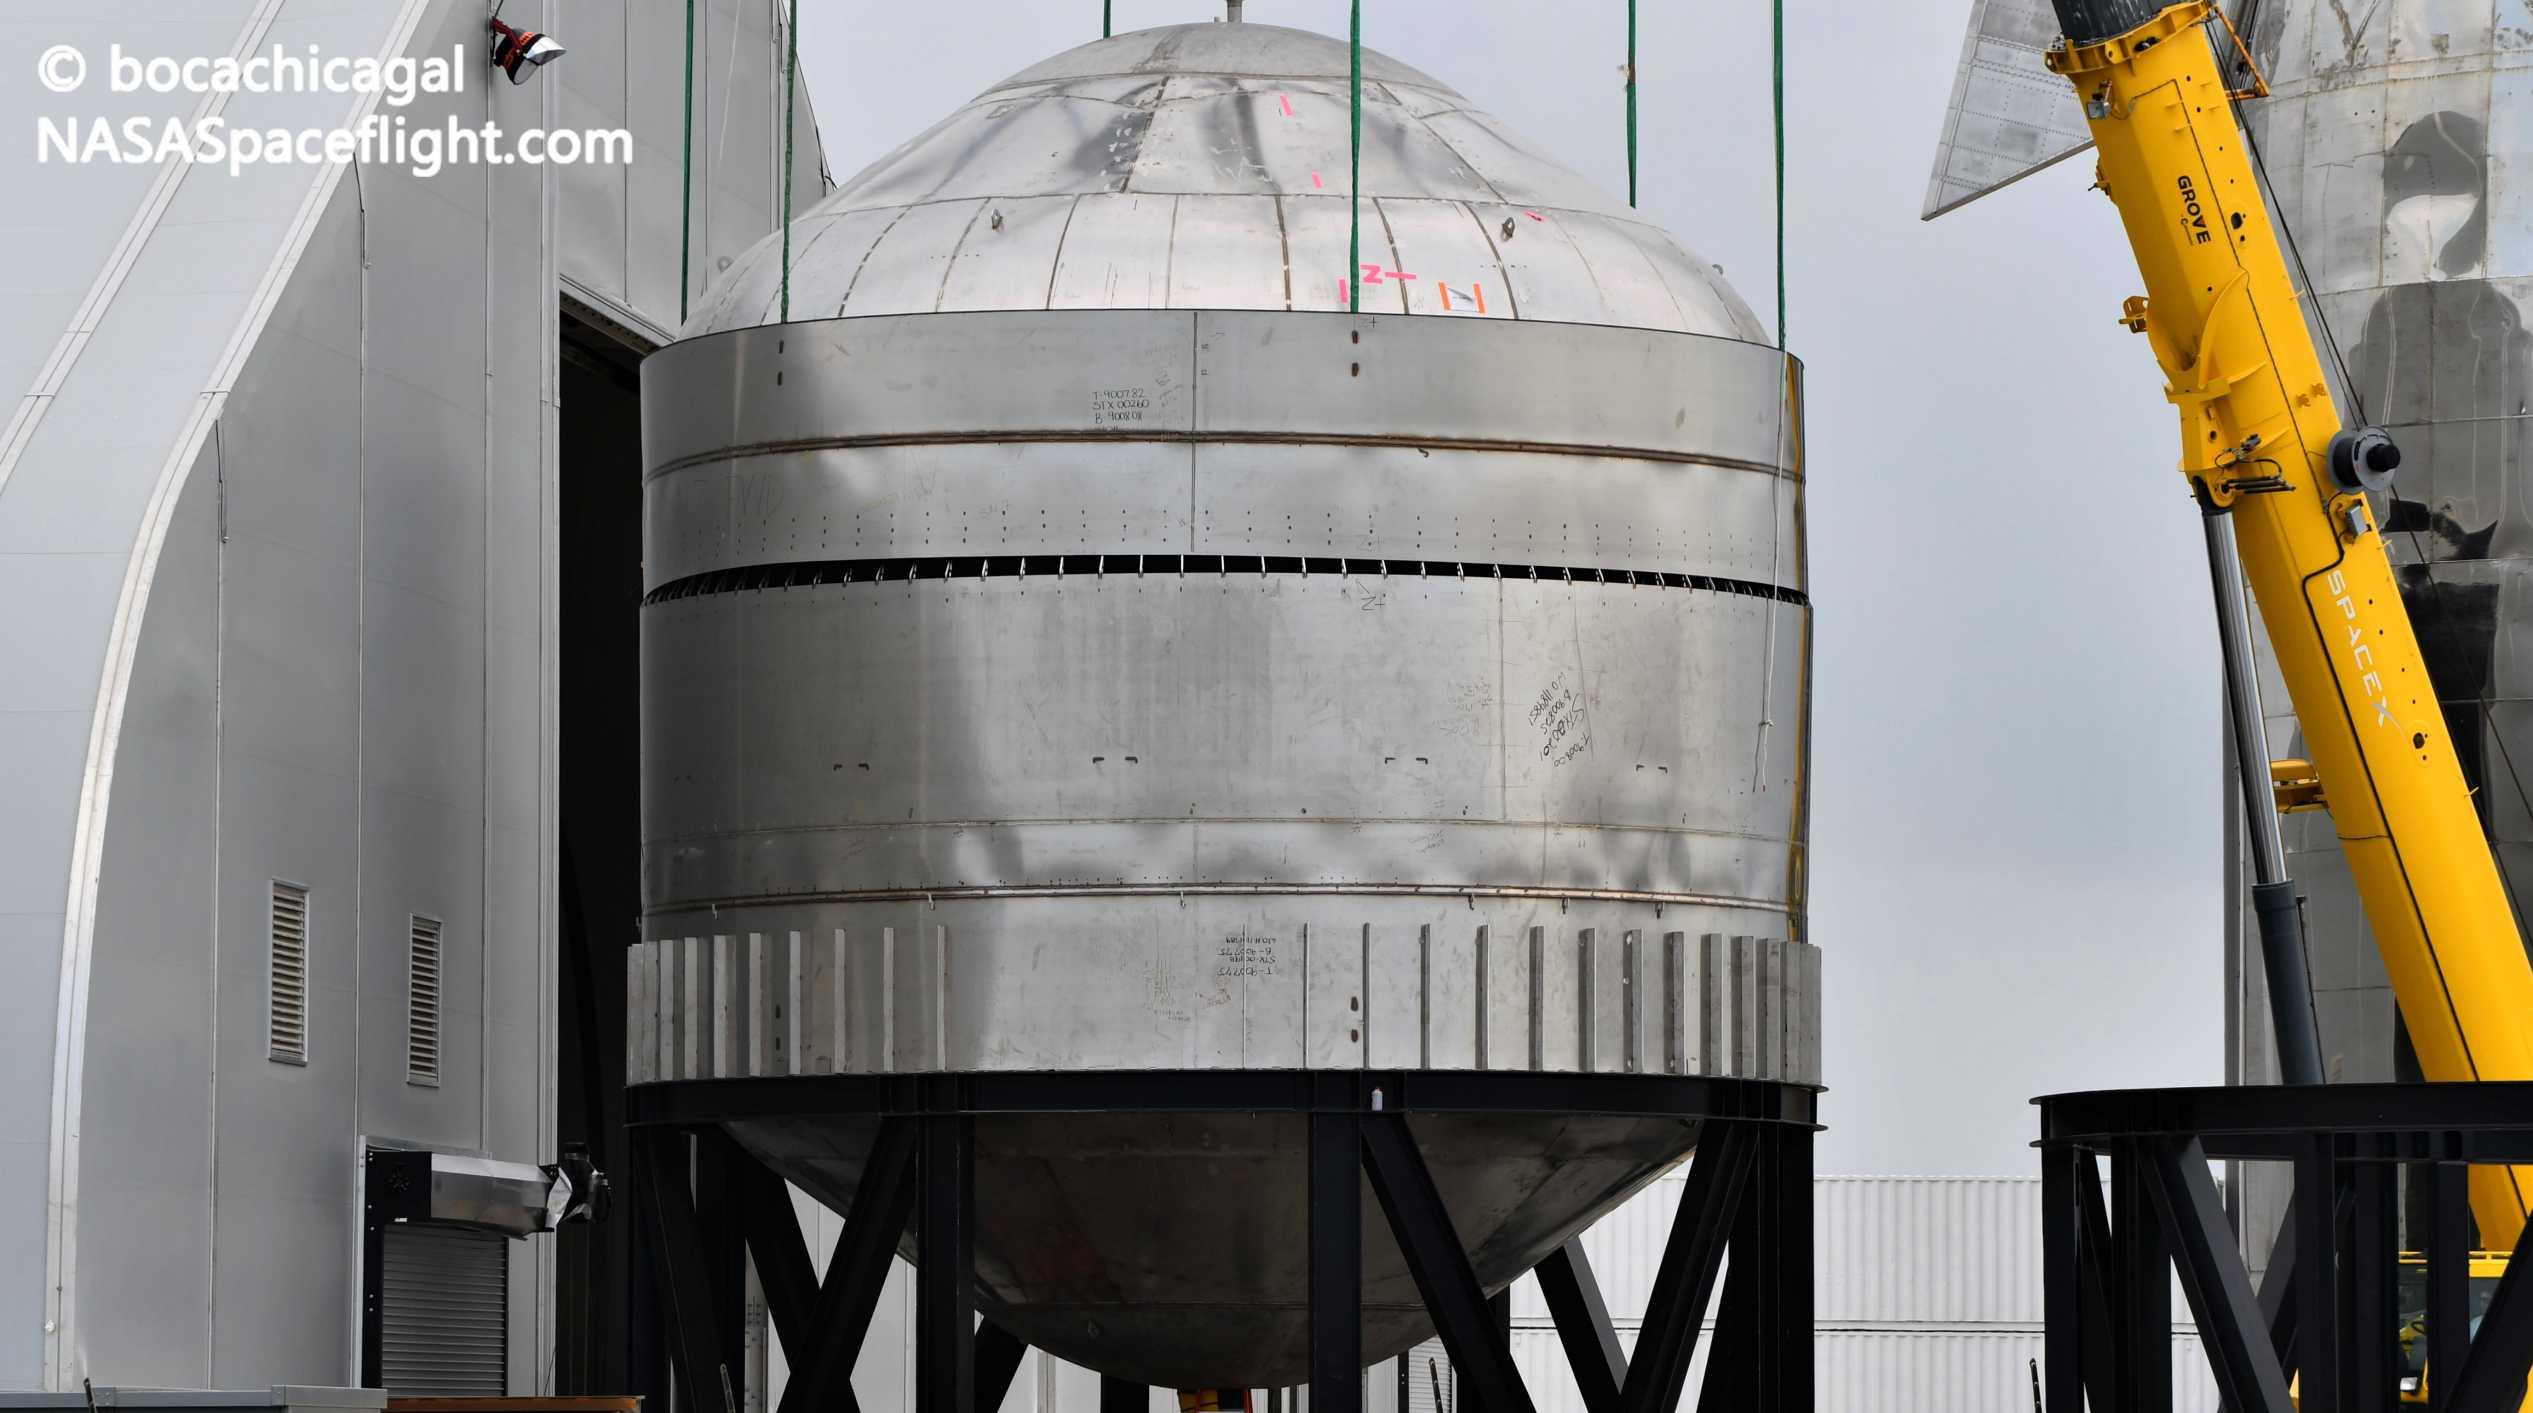 Starship Boca Chica 061020 (NASASpaceflight – bocachicagal) SN7 test tank mate 4 crop (c)